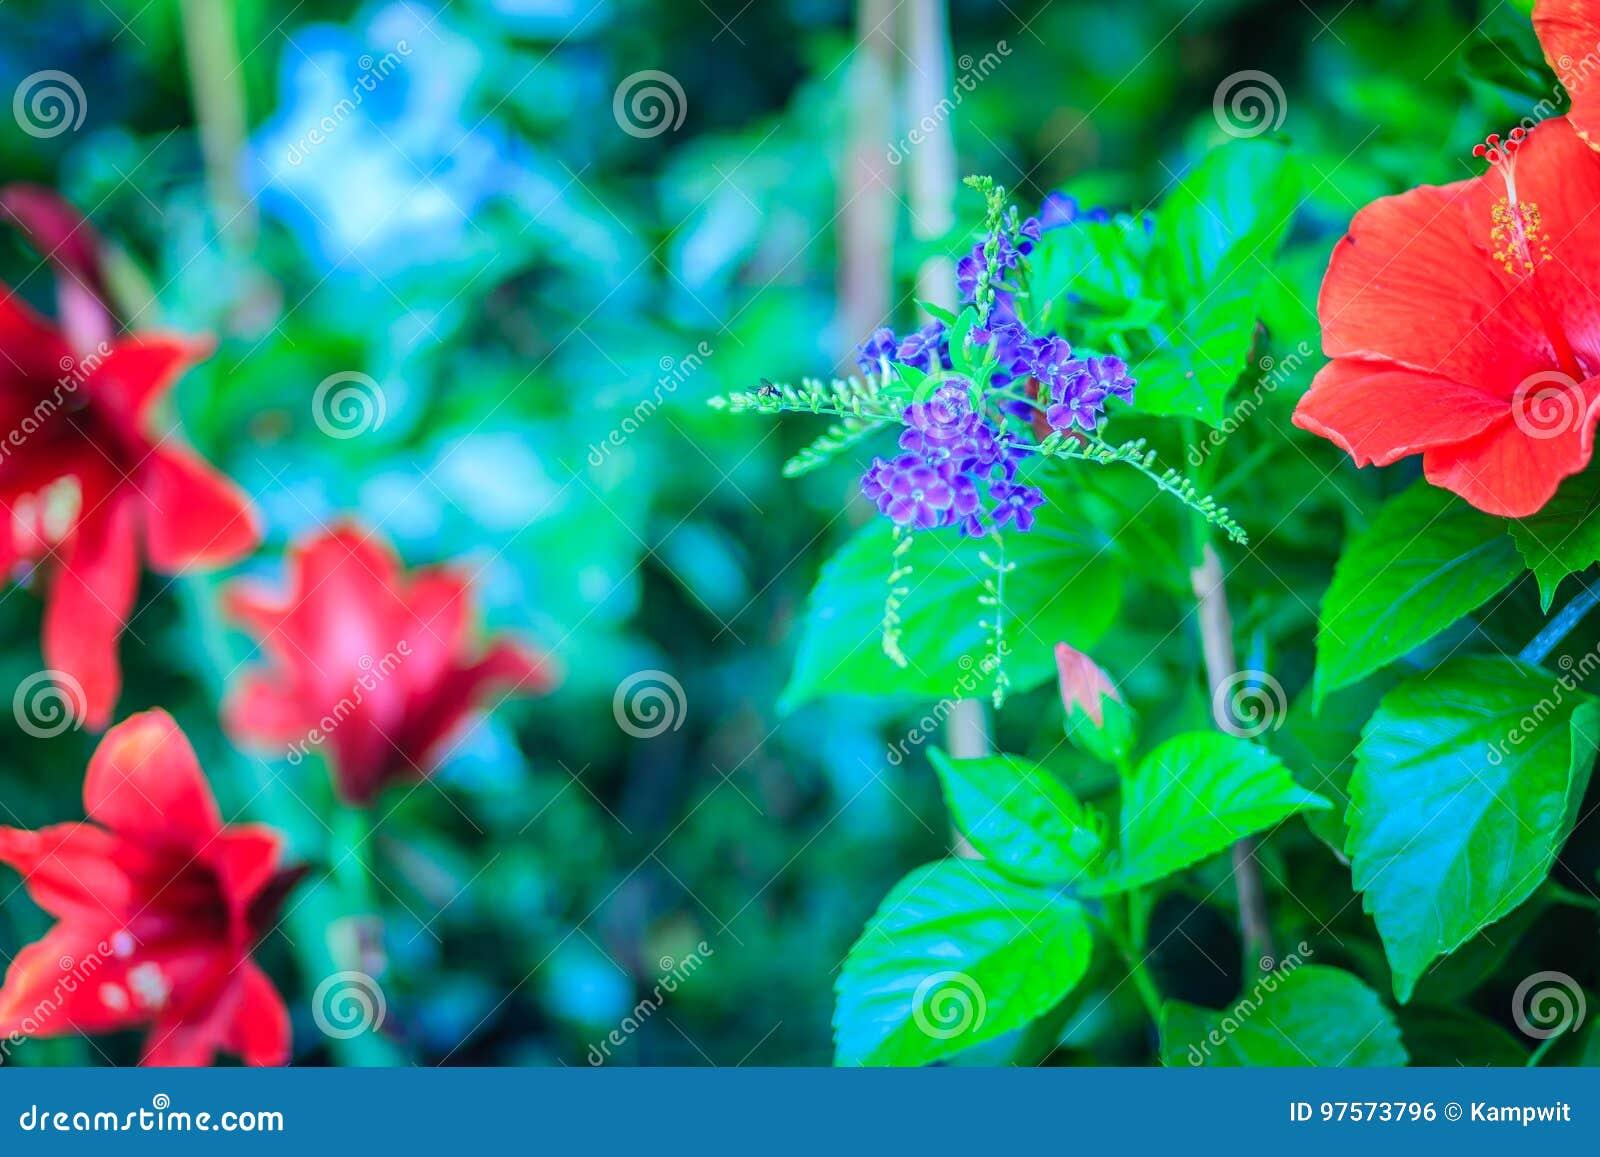 Duranta erecta purple flowers between red flowers common names duranta erecta purple flowers between red flowers common names mightylinksfo